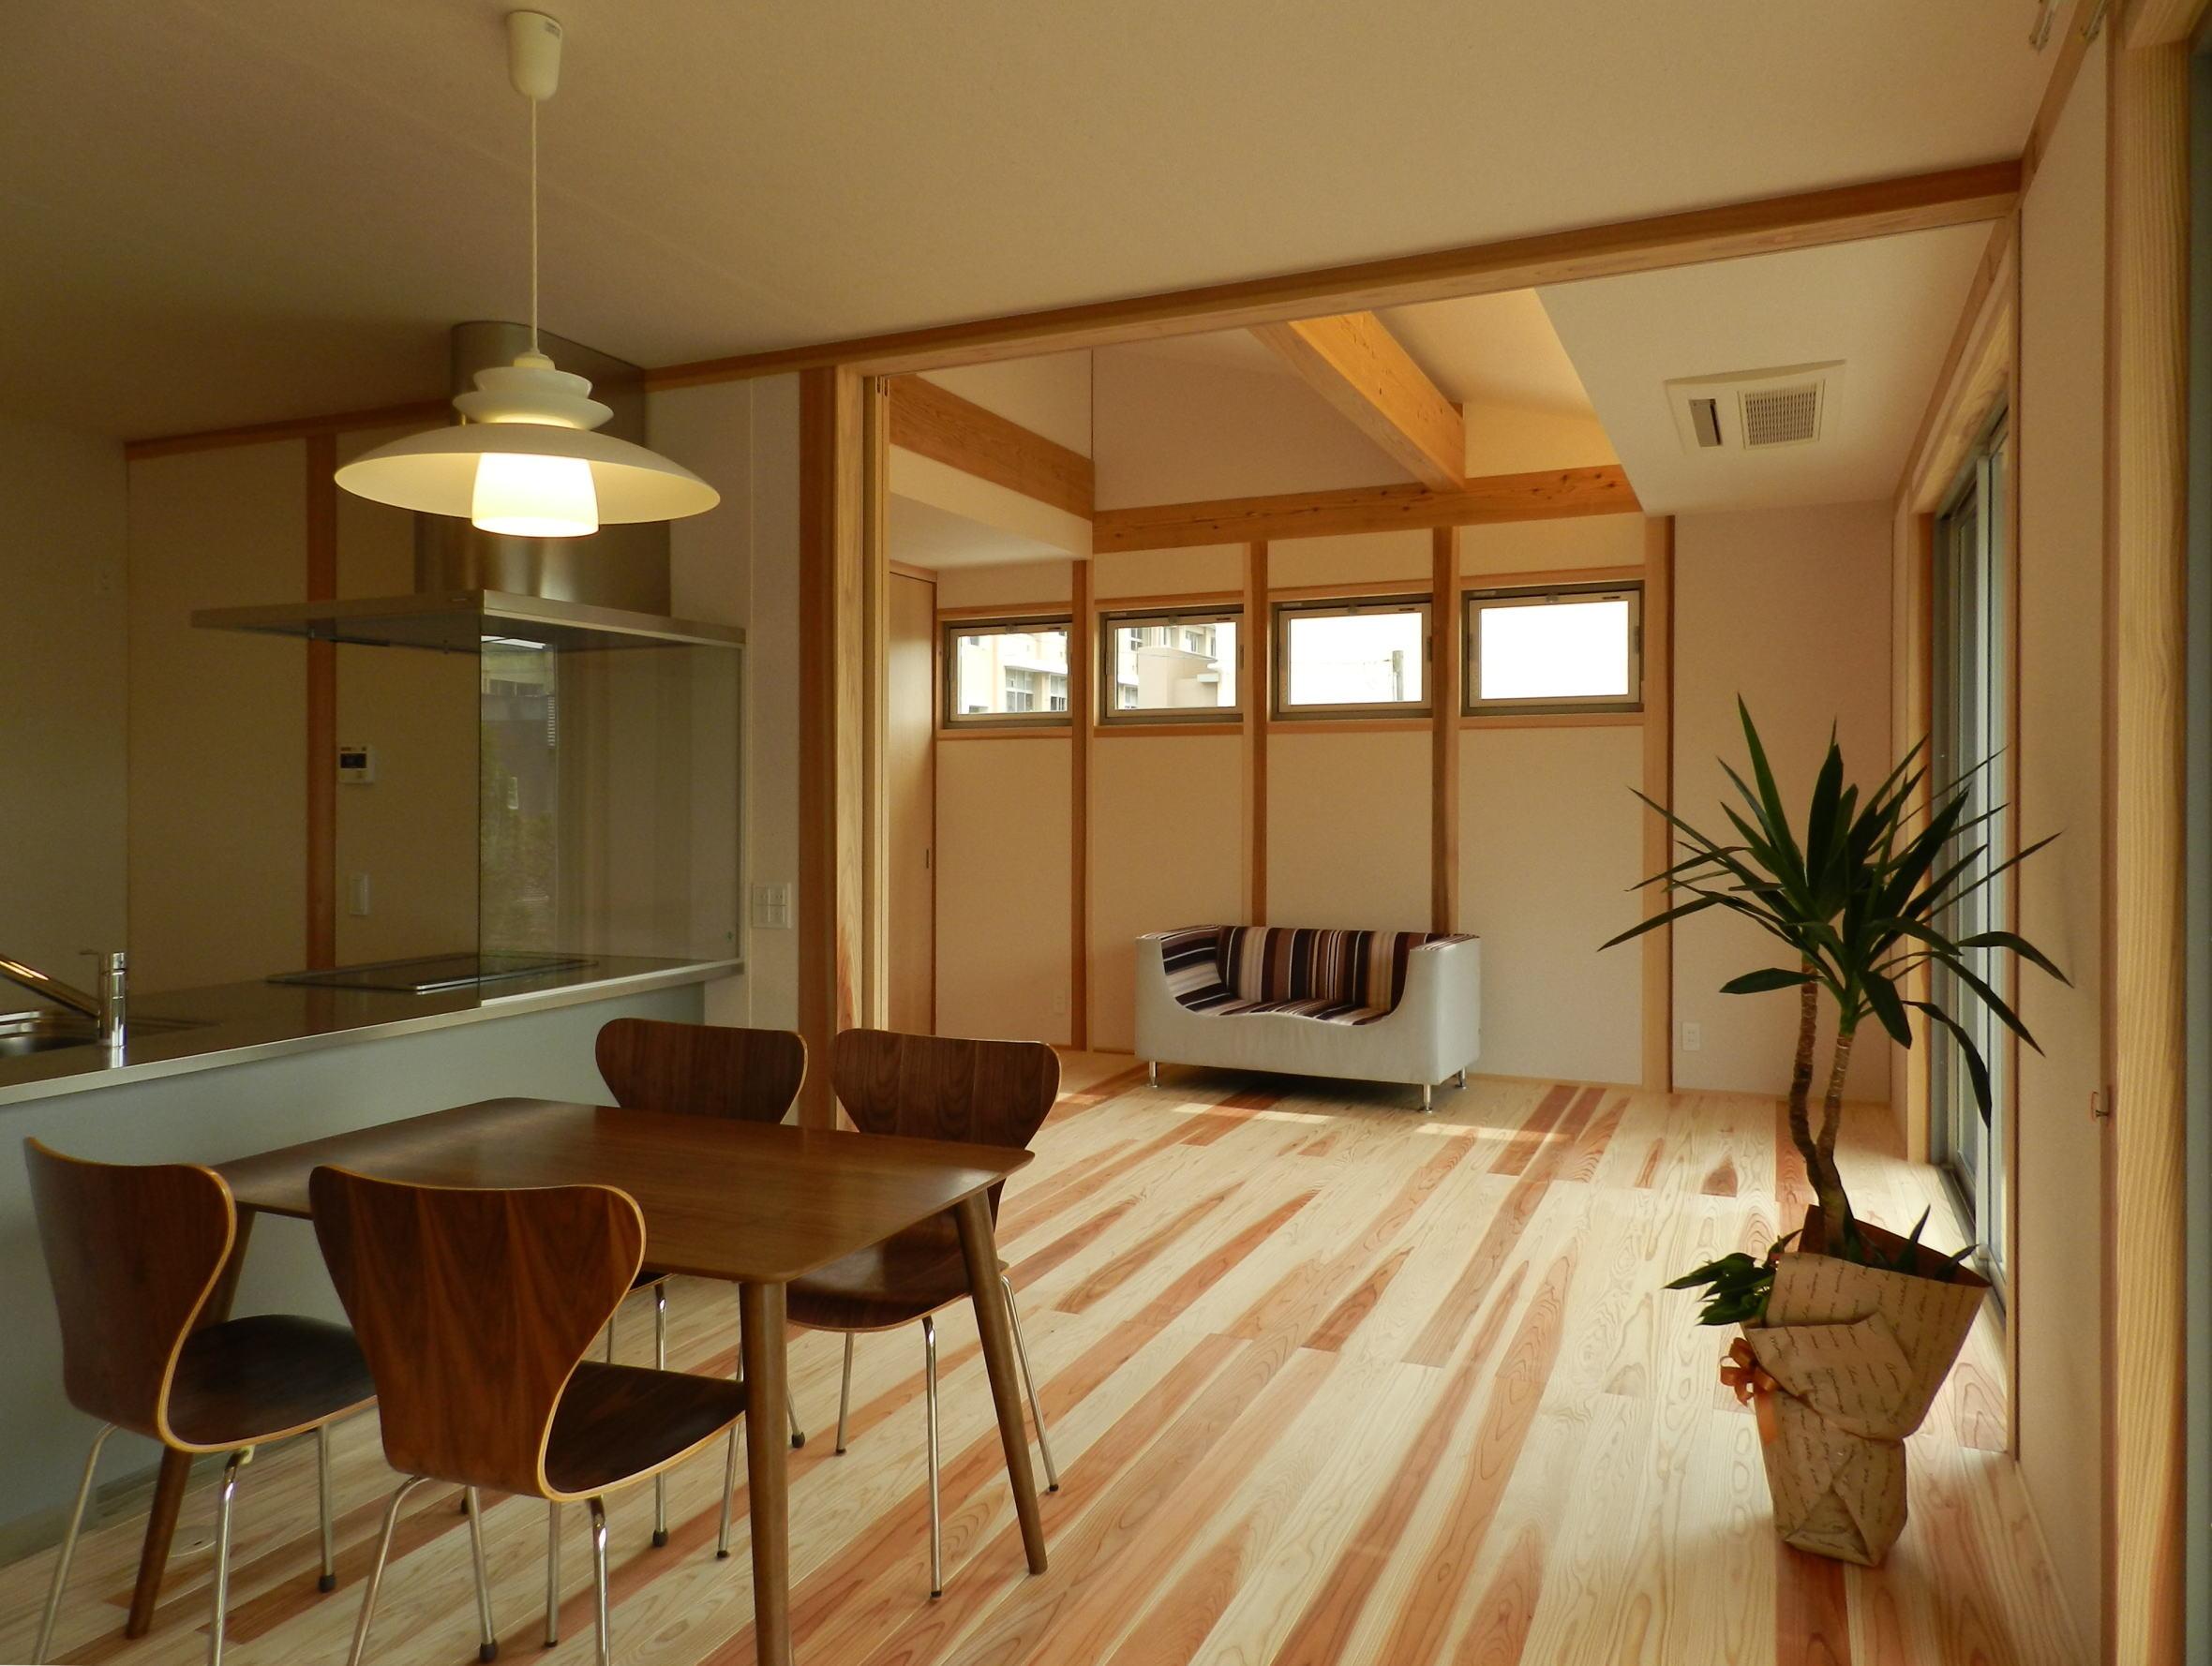 LDKの床は杉フローリング、壁・天井は和紙貼りの仕上げ材を採用しています。